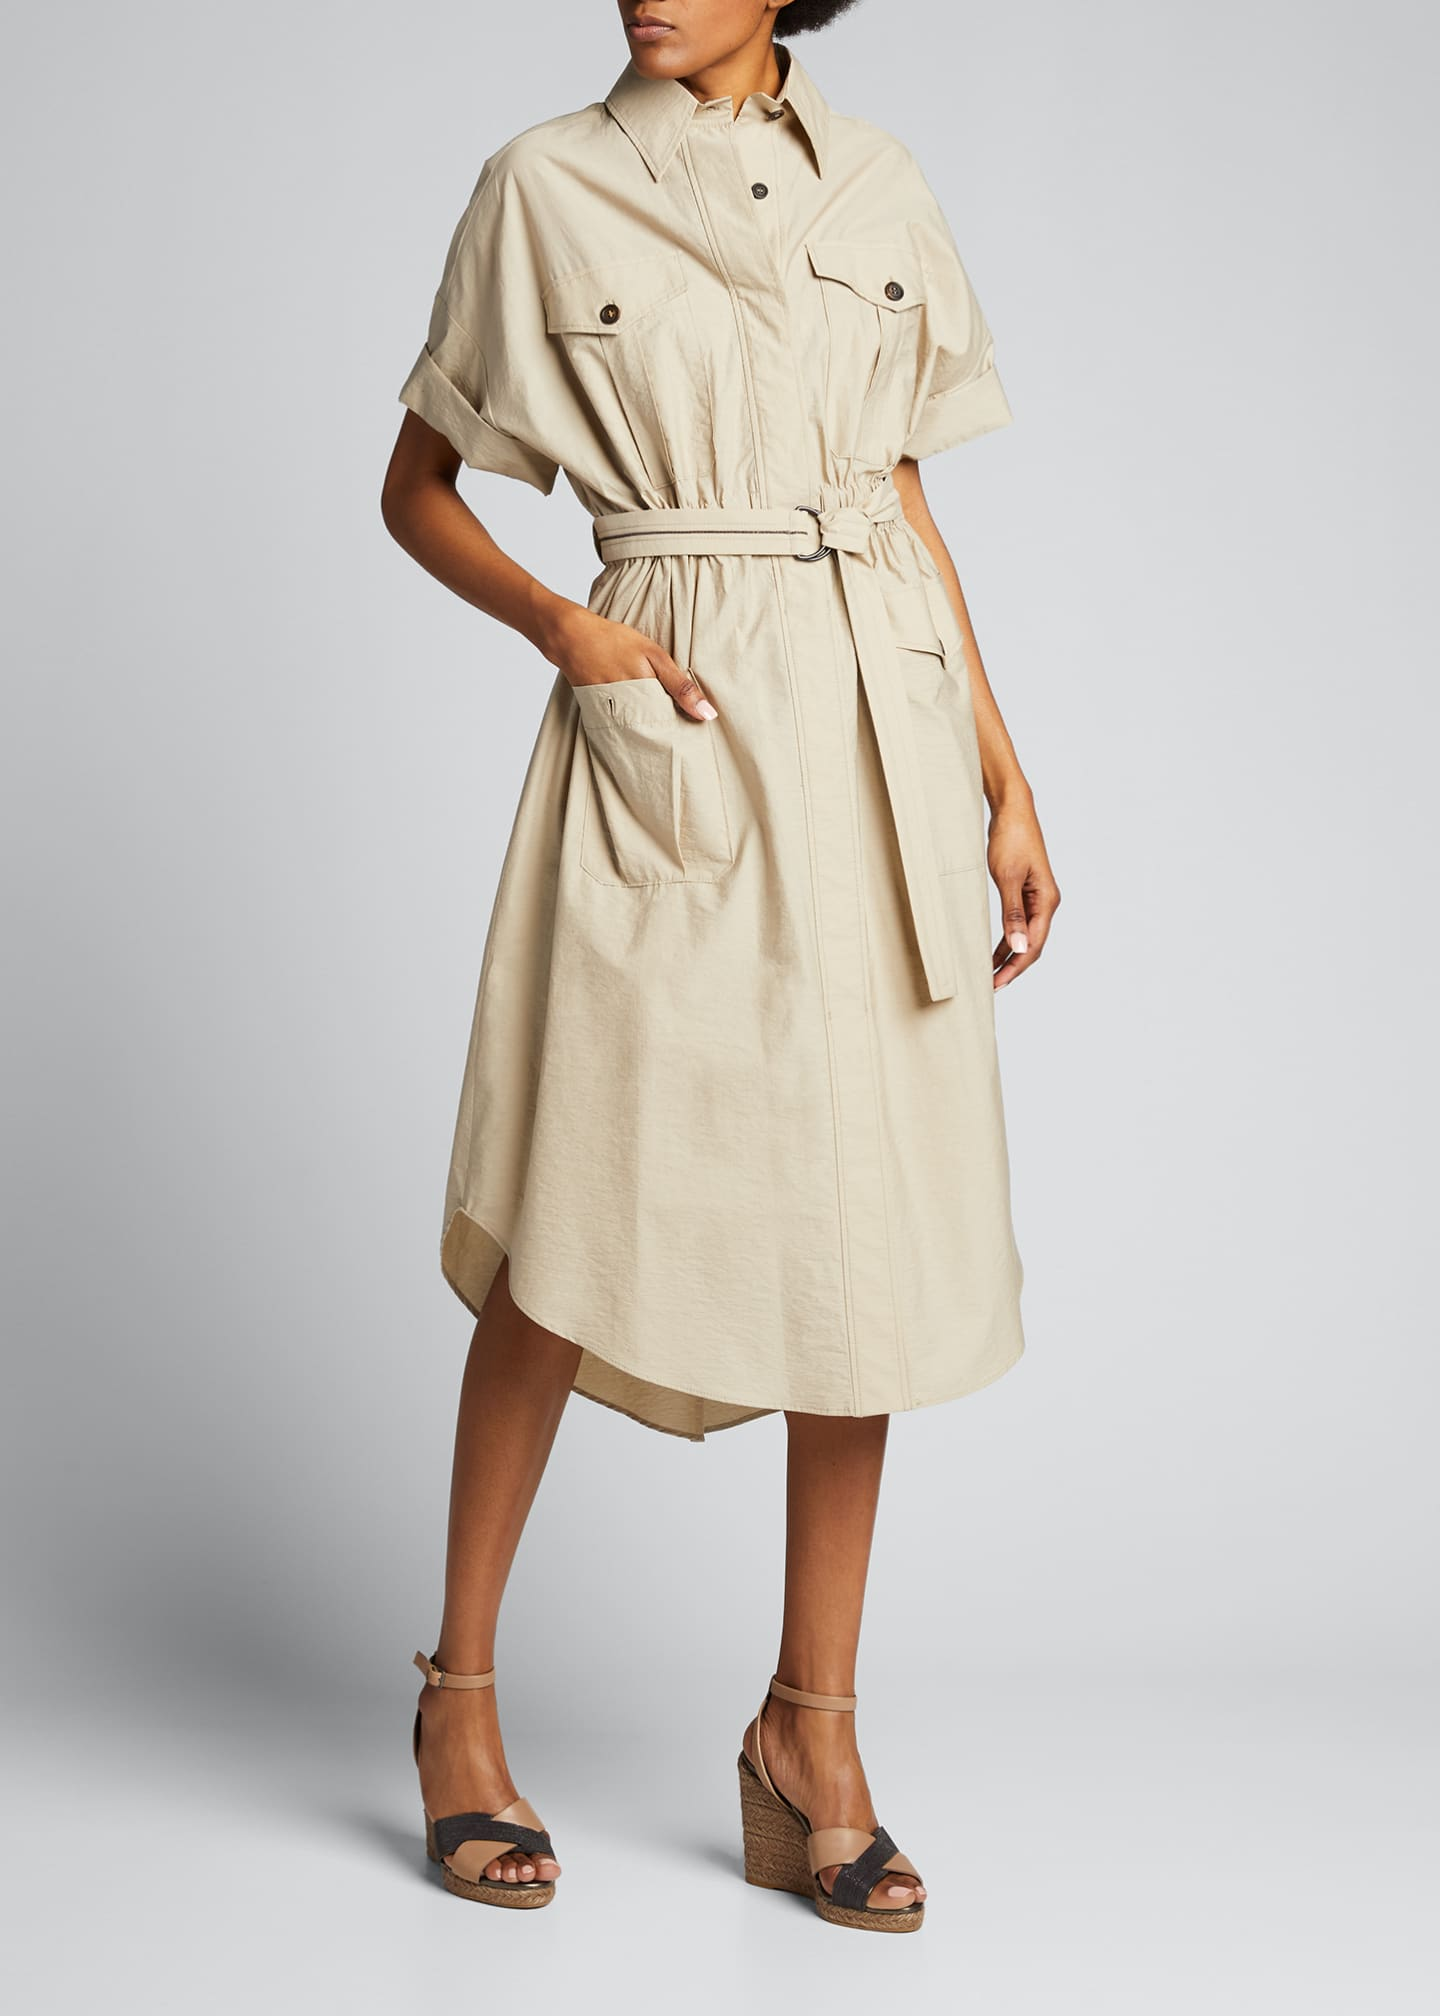 Brunello Cucinelli Techno Poplin Belted Dress